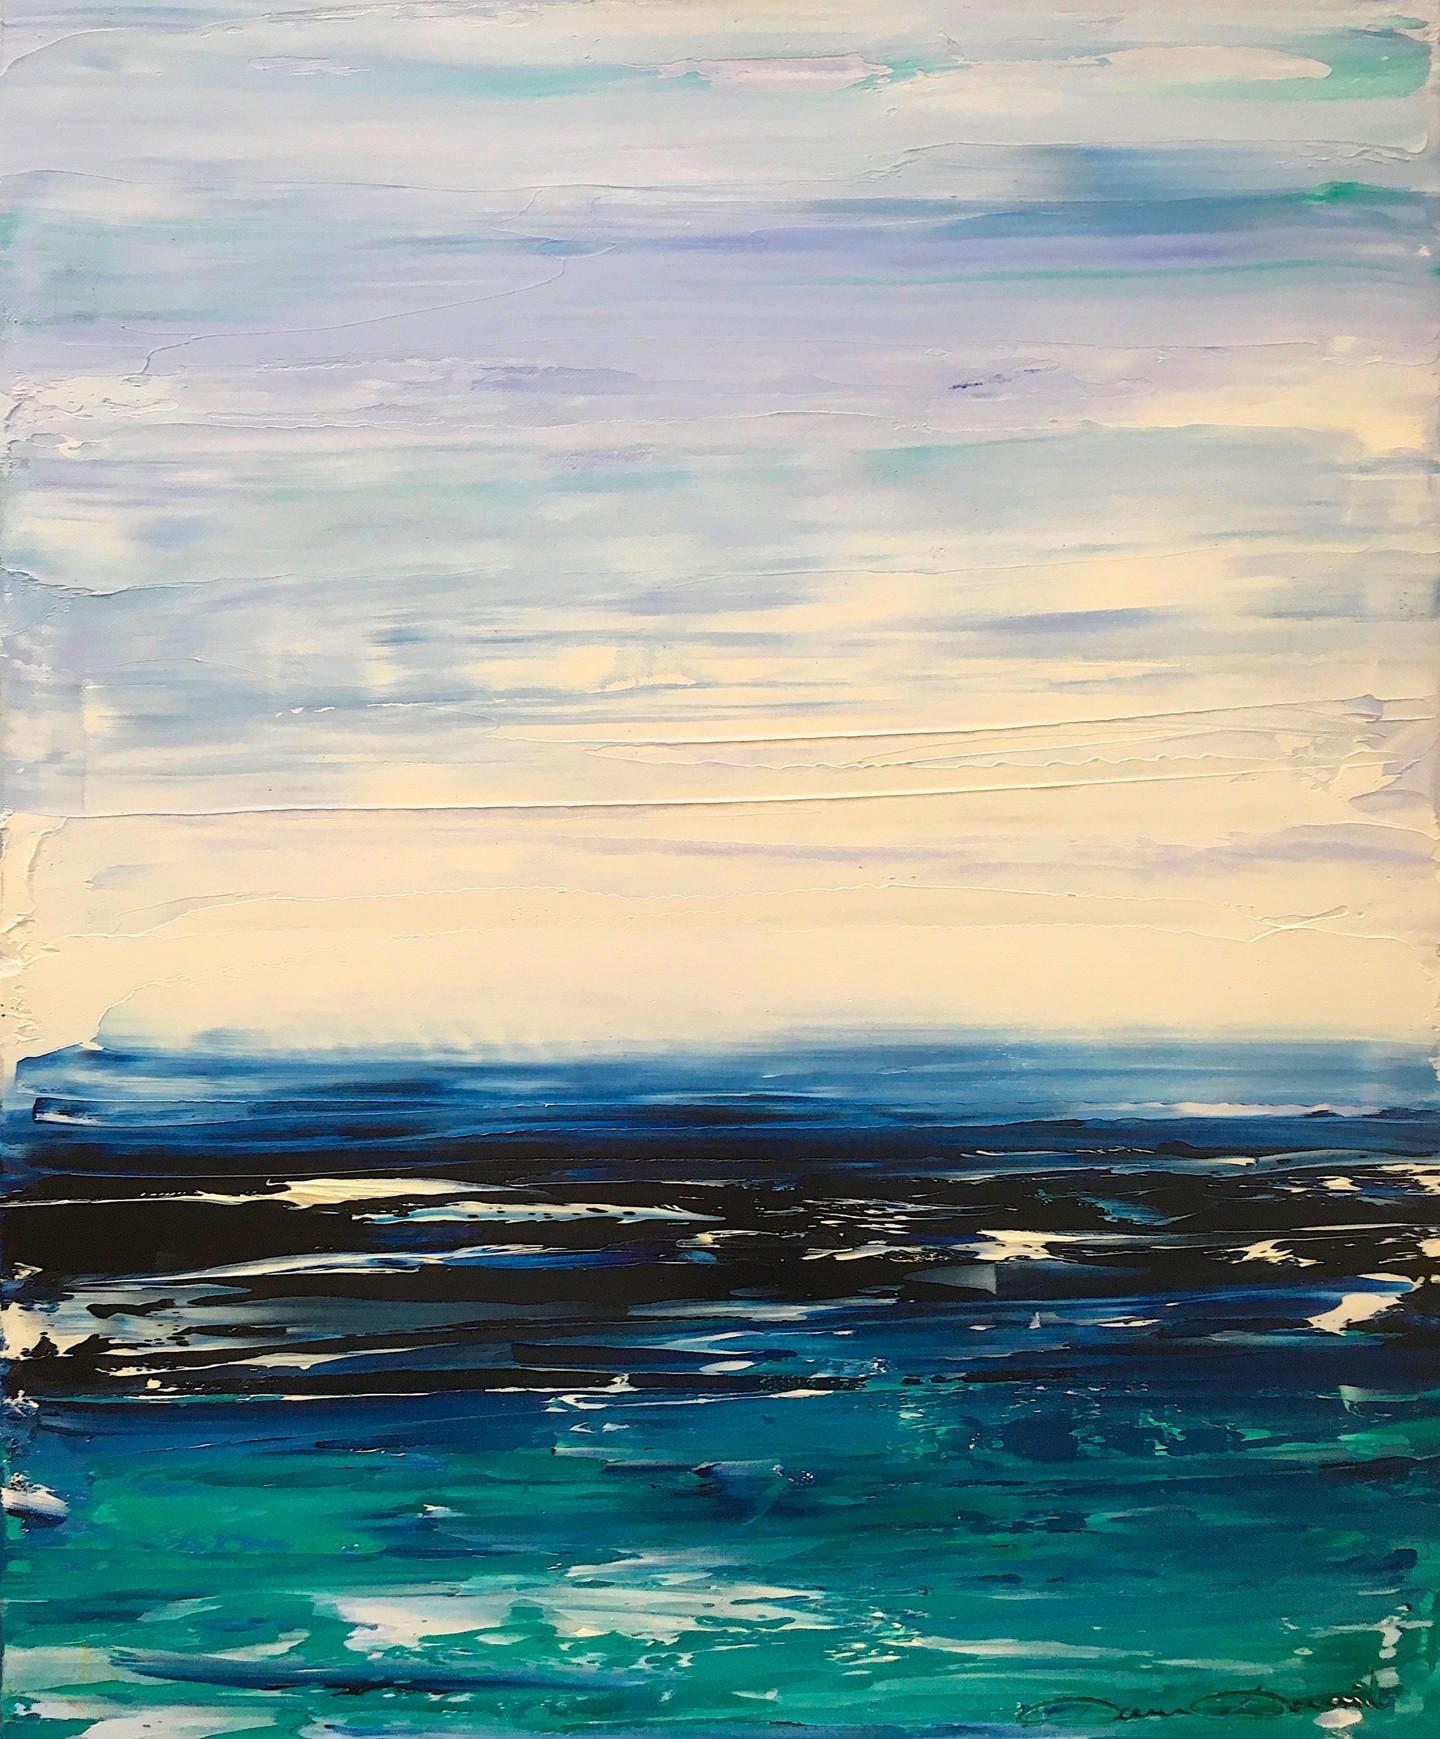 Dam Domido - Wonderfull blue world